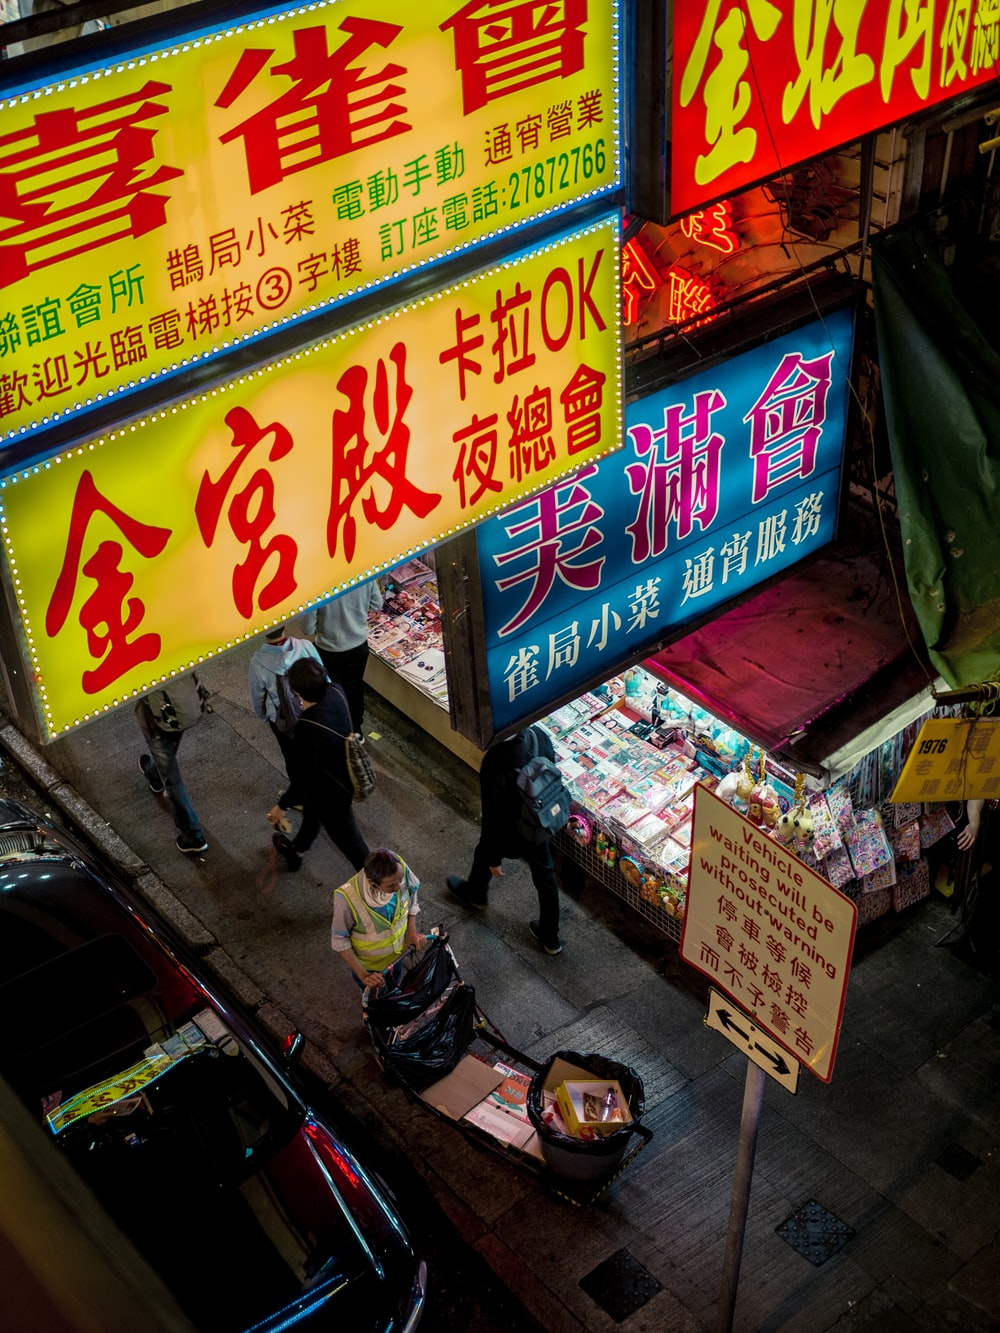 people walking on sidewalk under lighted store signs